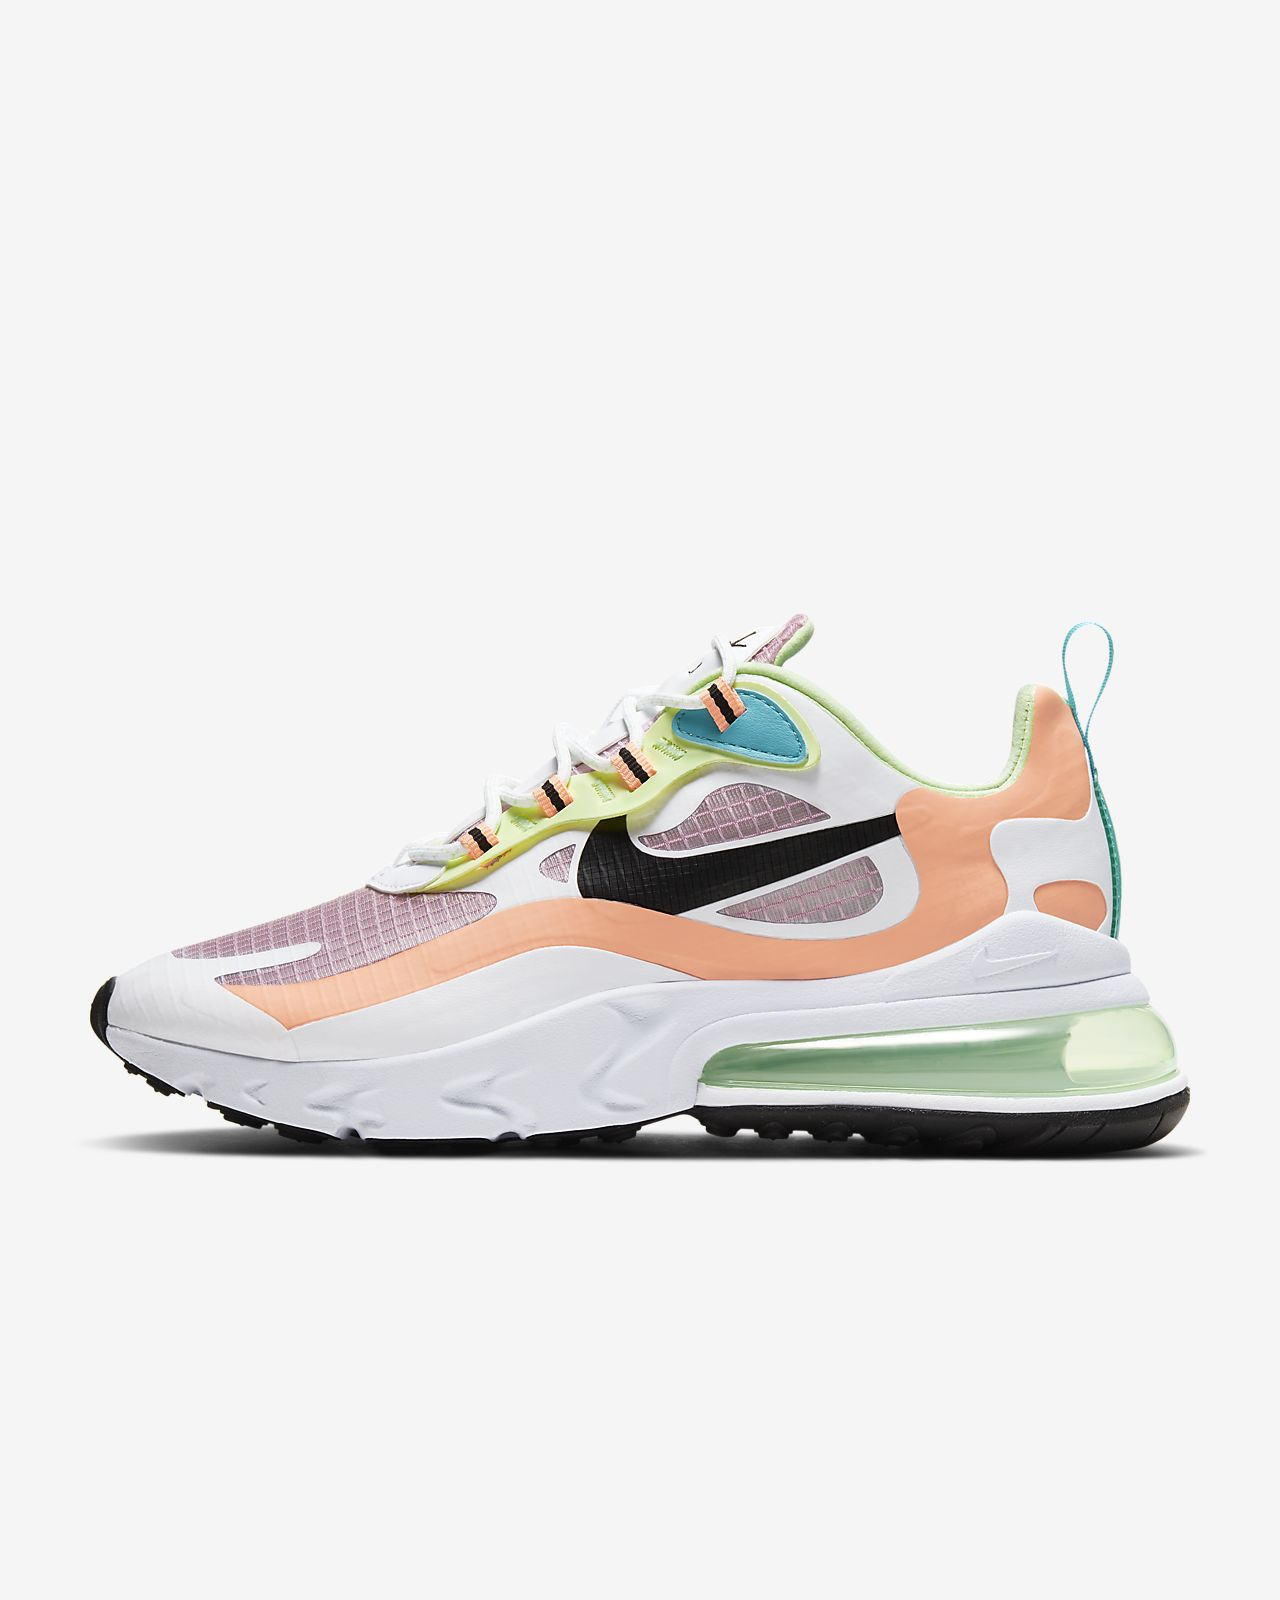 Sapatilhas Nike Air Max 270 React SE para mulher